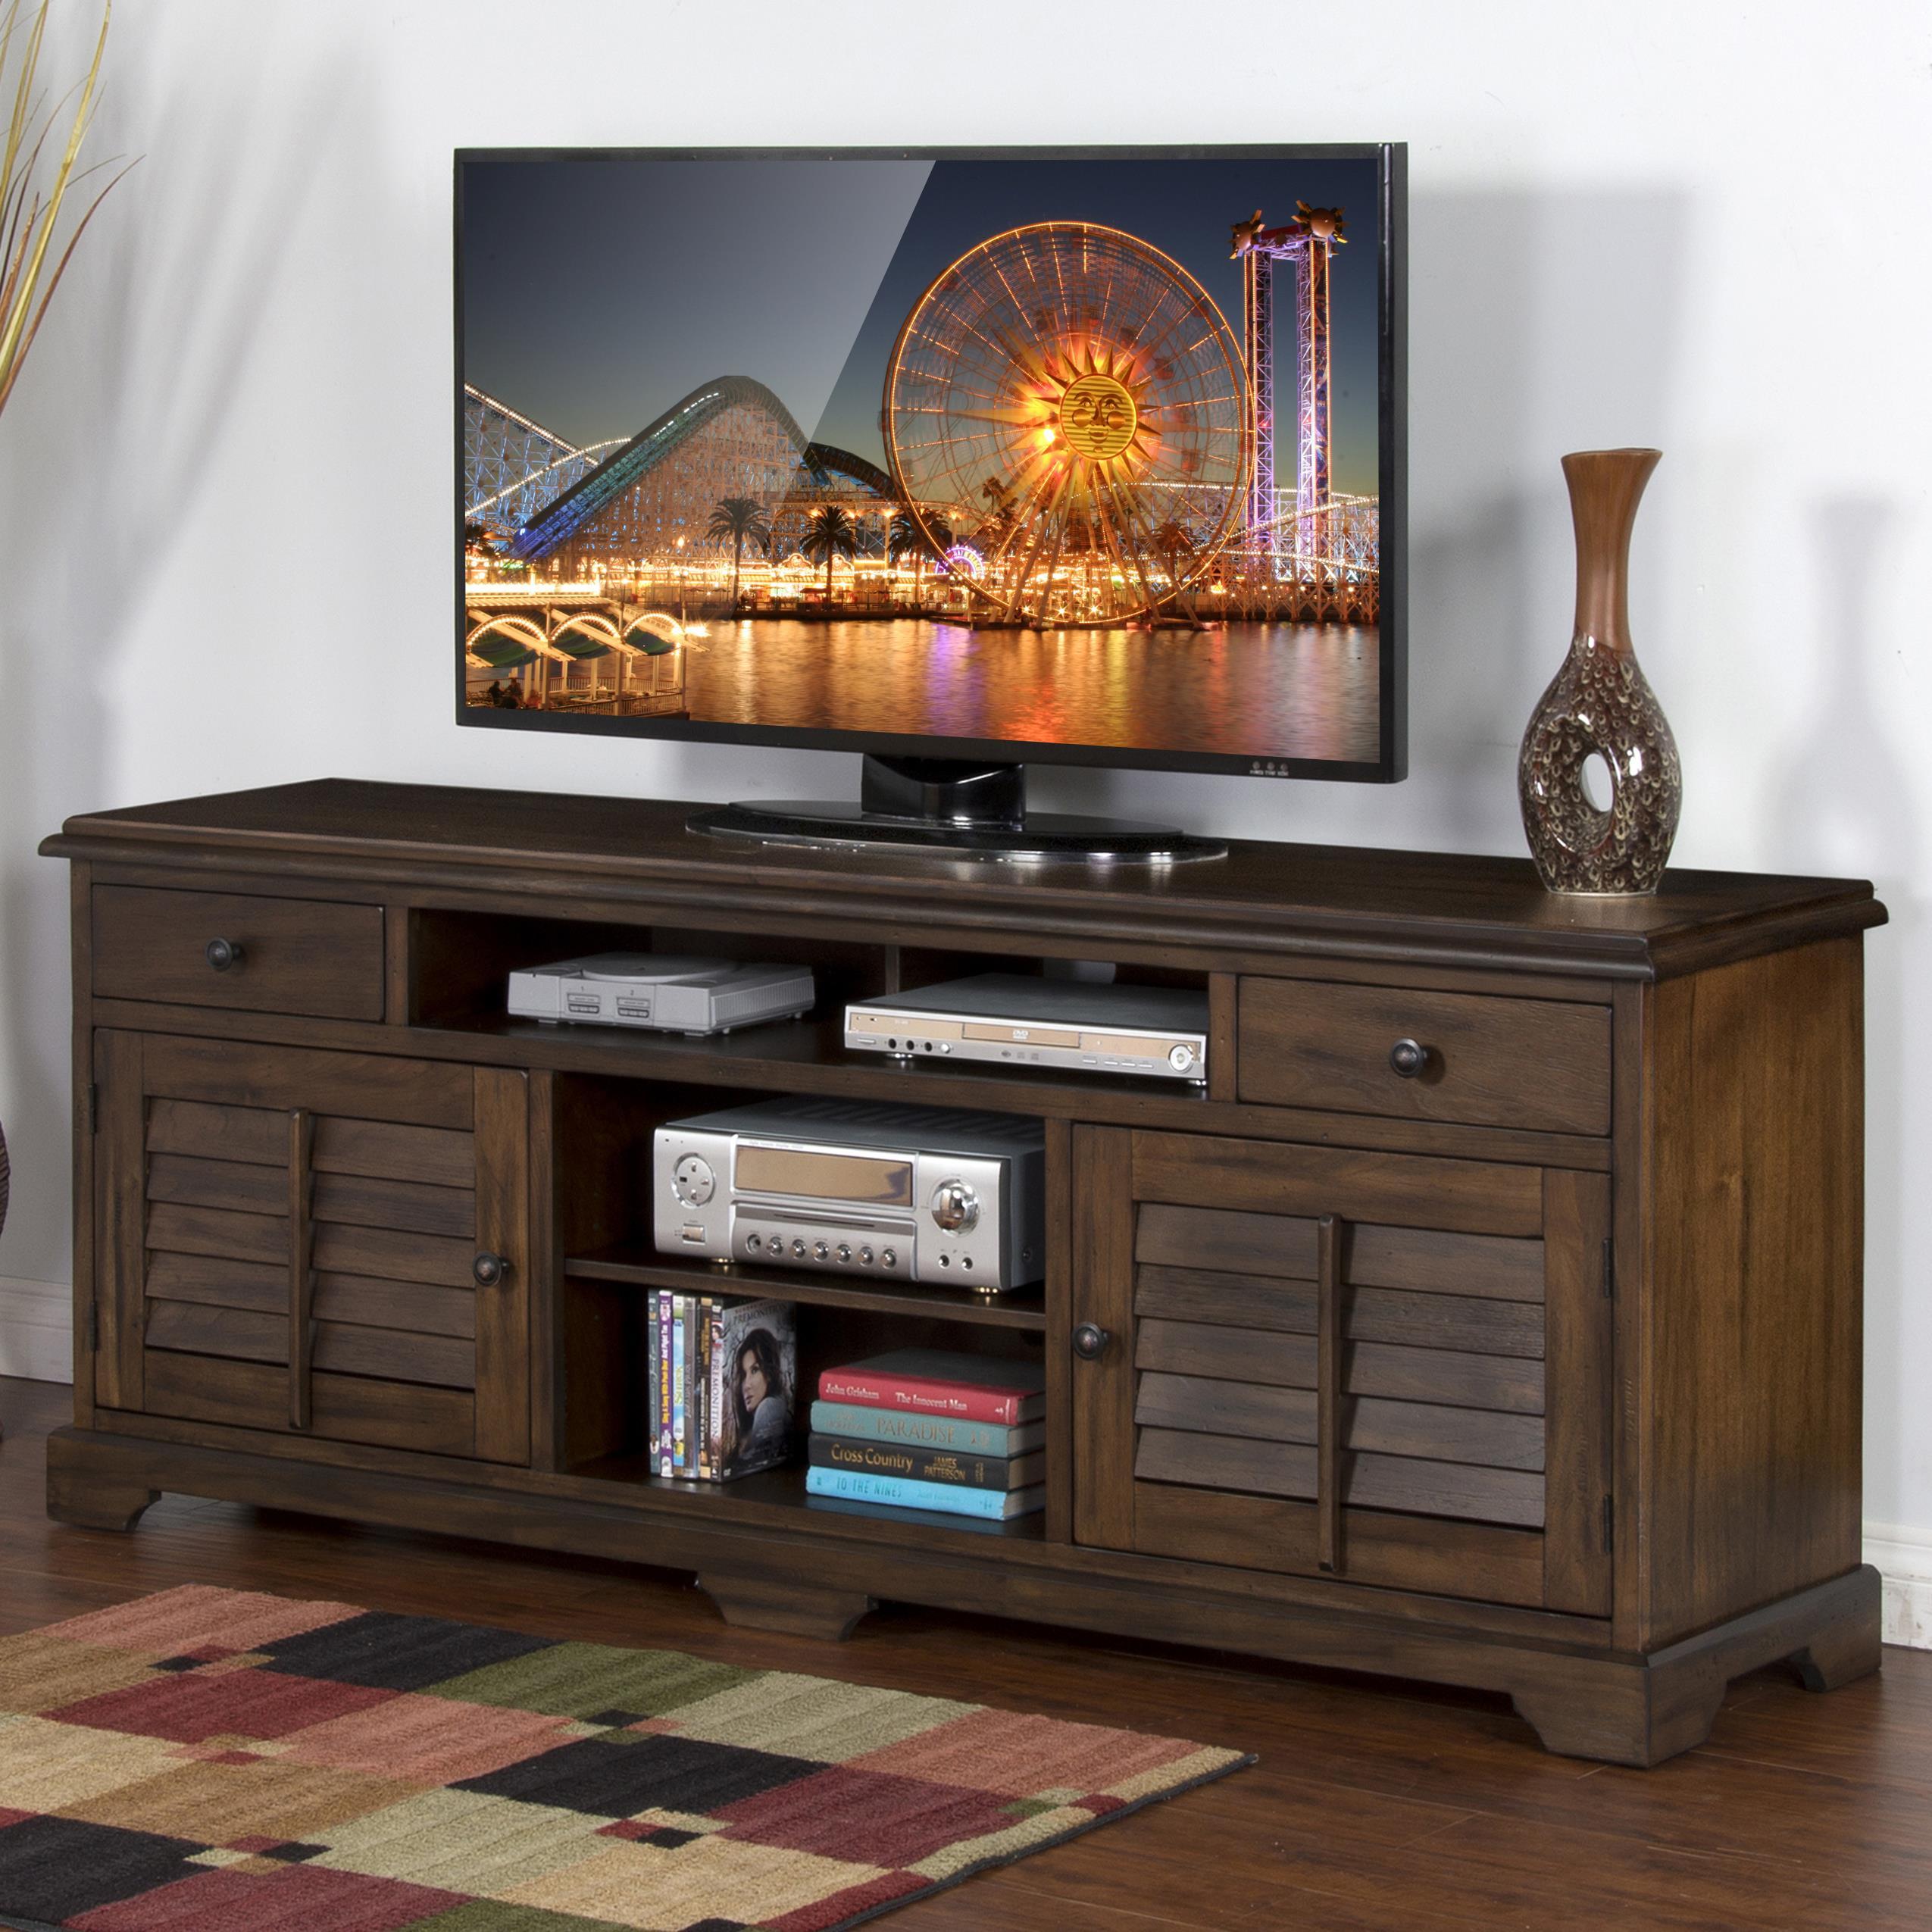 Sunny Designs Savannah 3497ac 78 78 Tv Console With